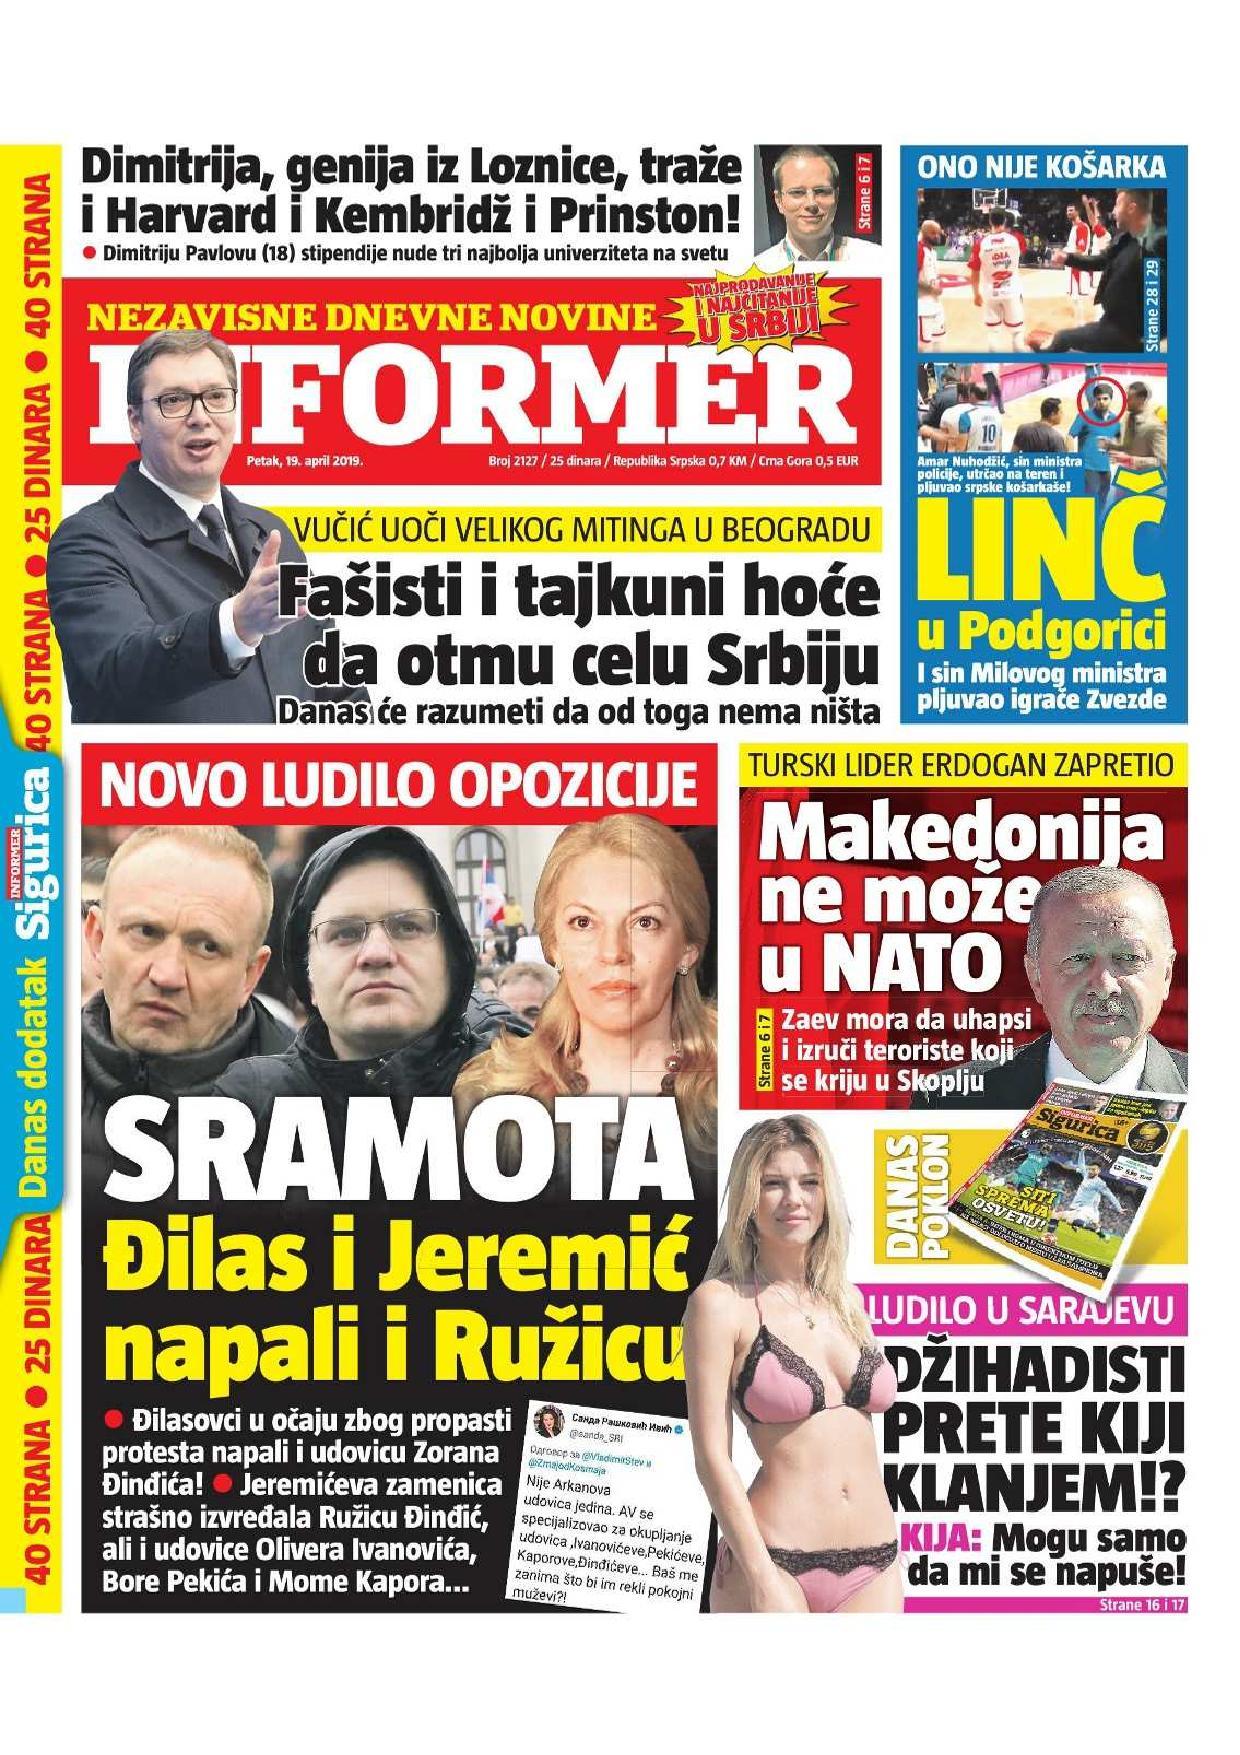 Simon Gipps Kent Top 10 Dnevne Novine Blic Republika Srpska